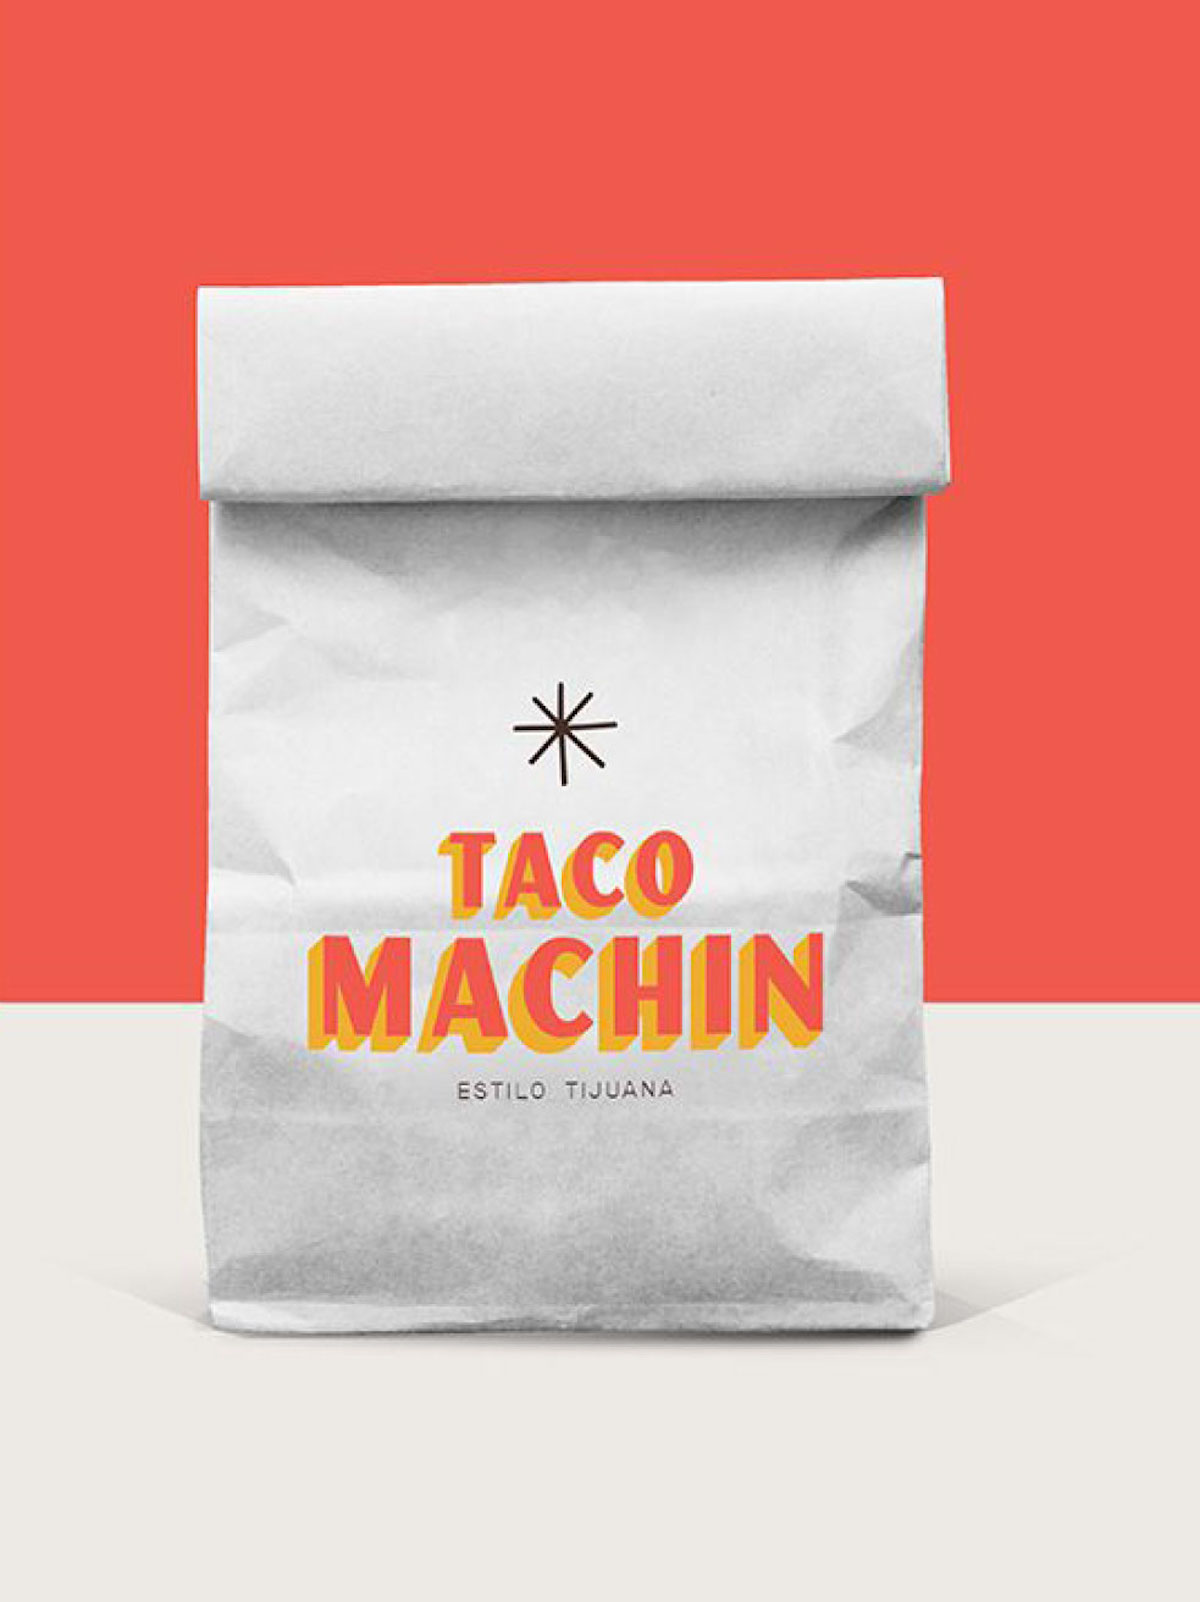 Luis Peña's Taco Machin is Headed to Bonita